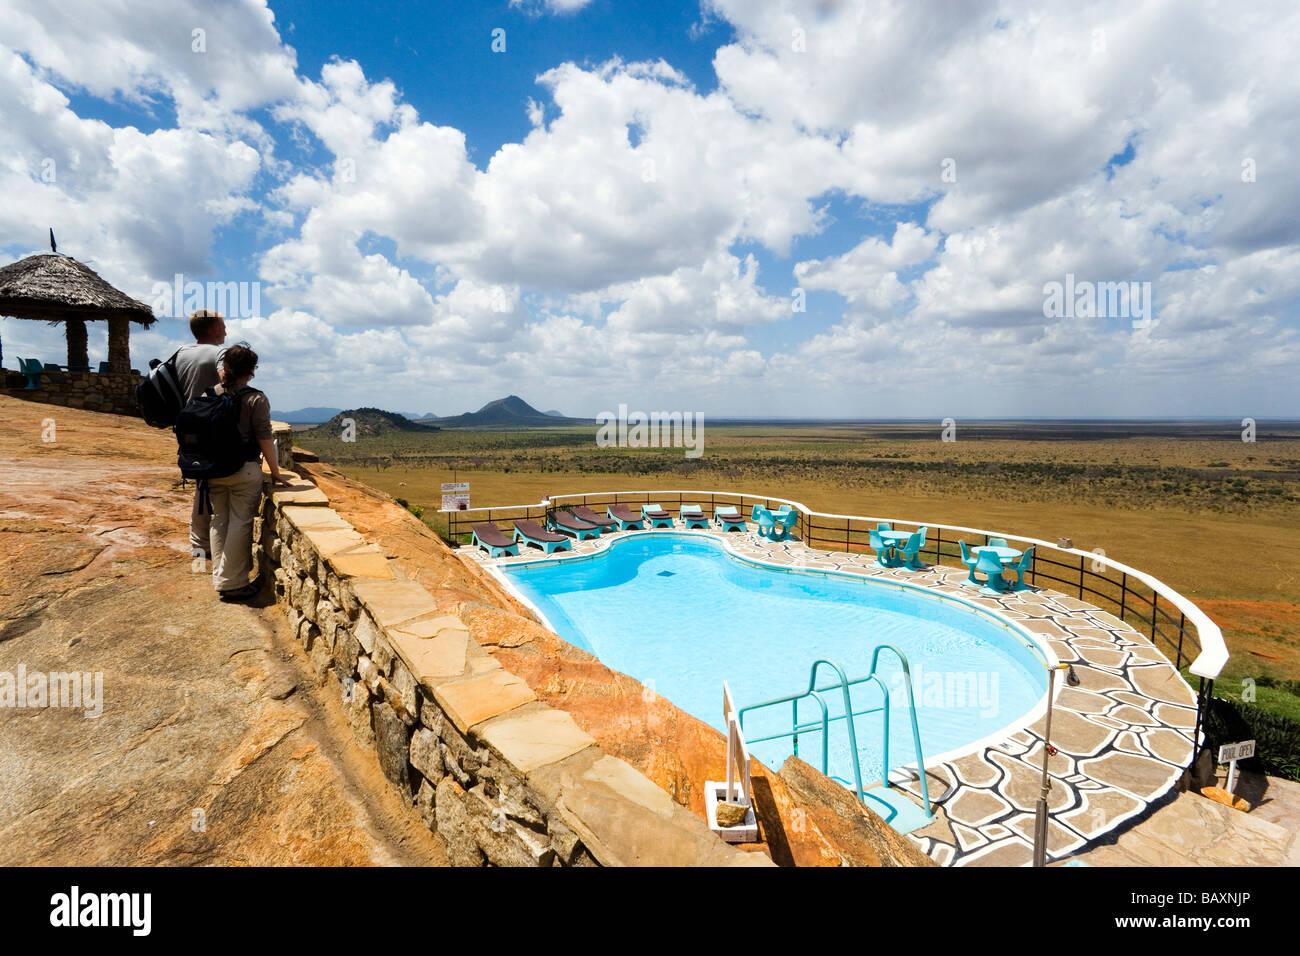 Guests looking over swimming pool to savannah, Voi Safari Lodge, Tsavo East National Park, Coast, Kenya - Stock Image